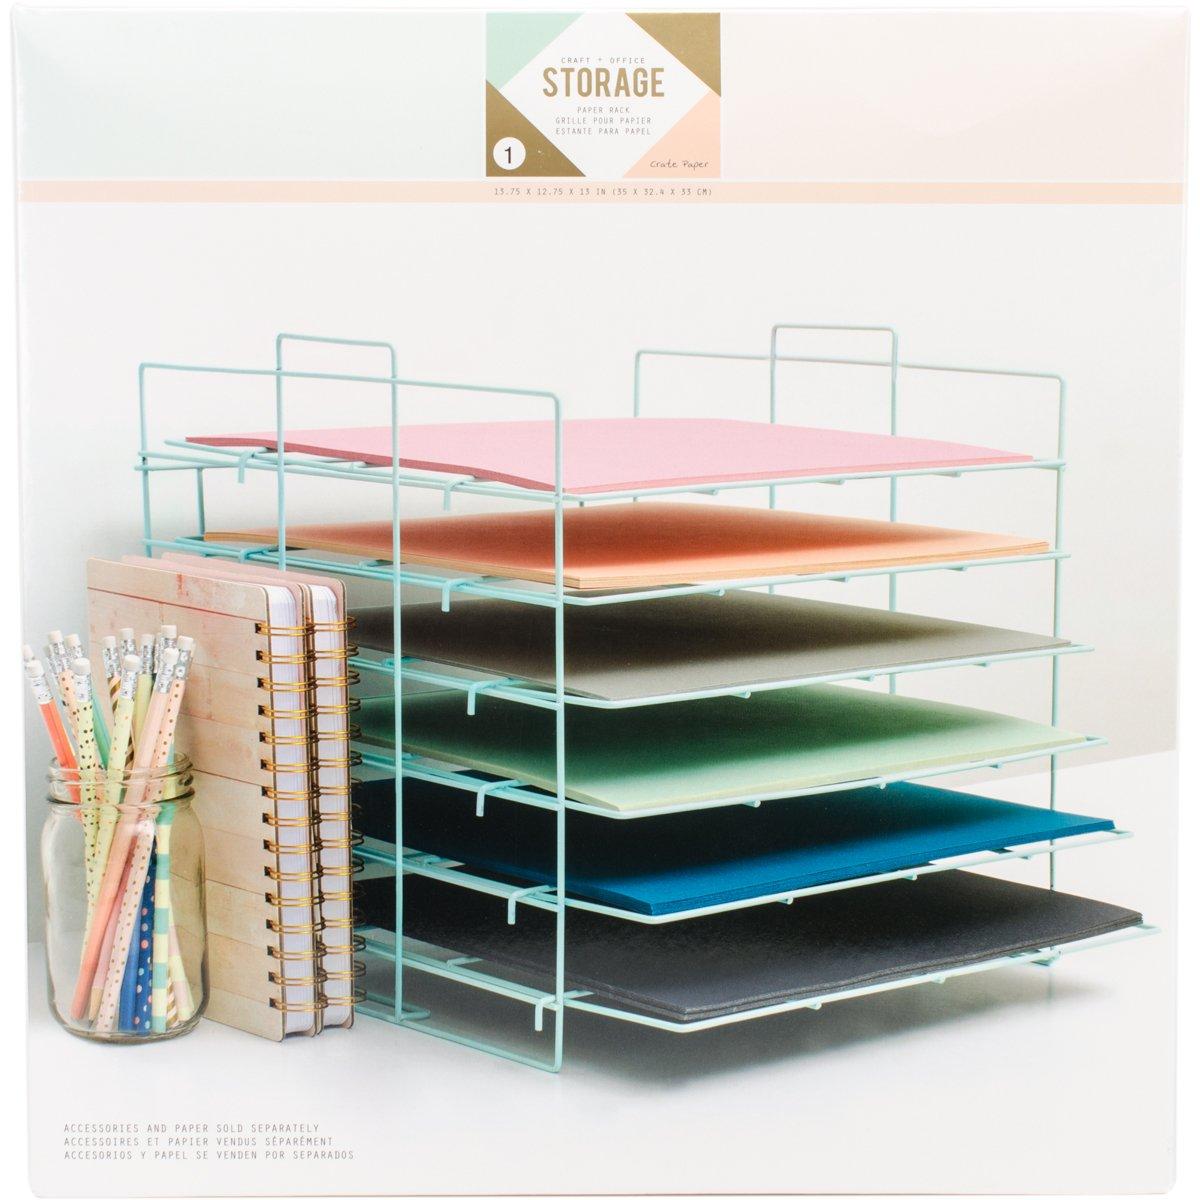 American Crafts 375798 Paper Rack Crate Paper Desktop Storage Paper Rack